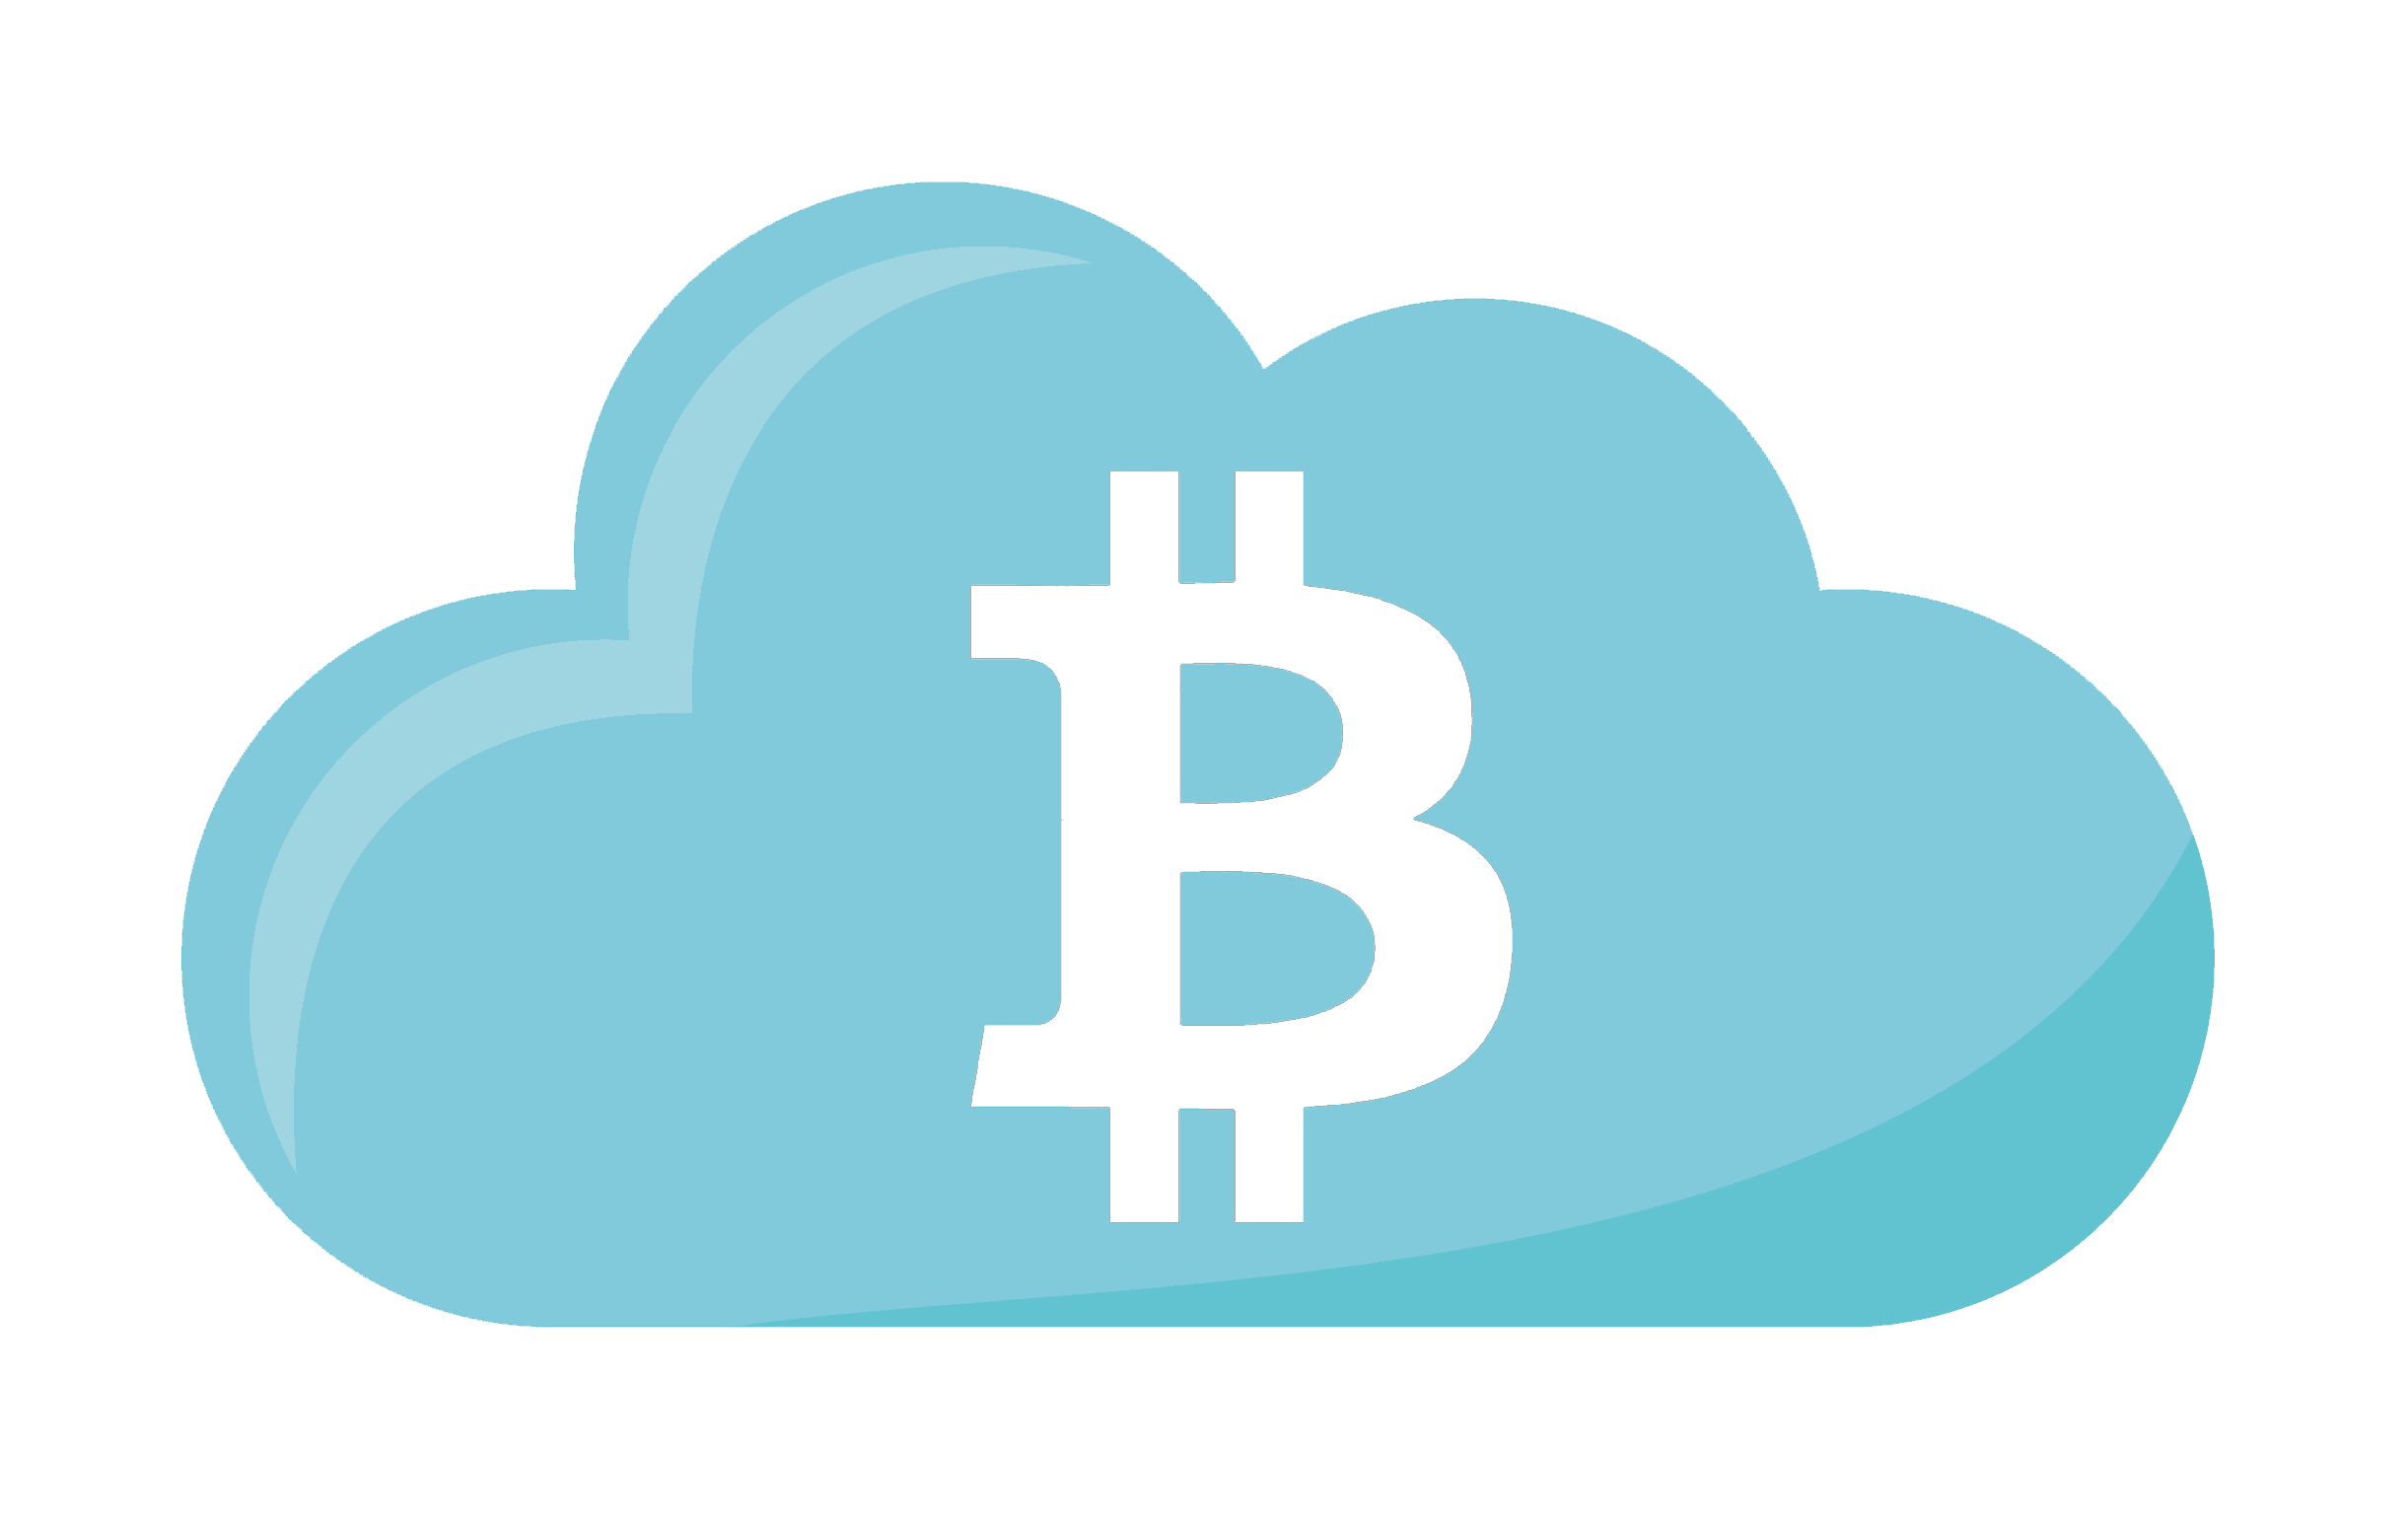 Bitcoin cloud